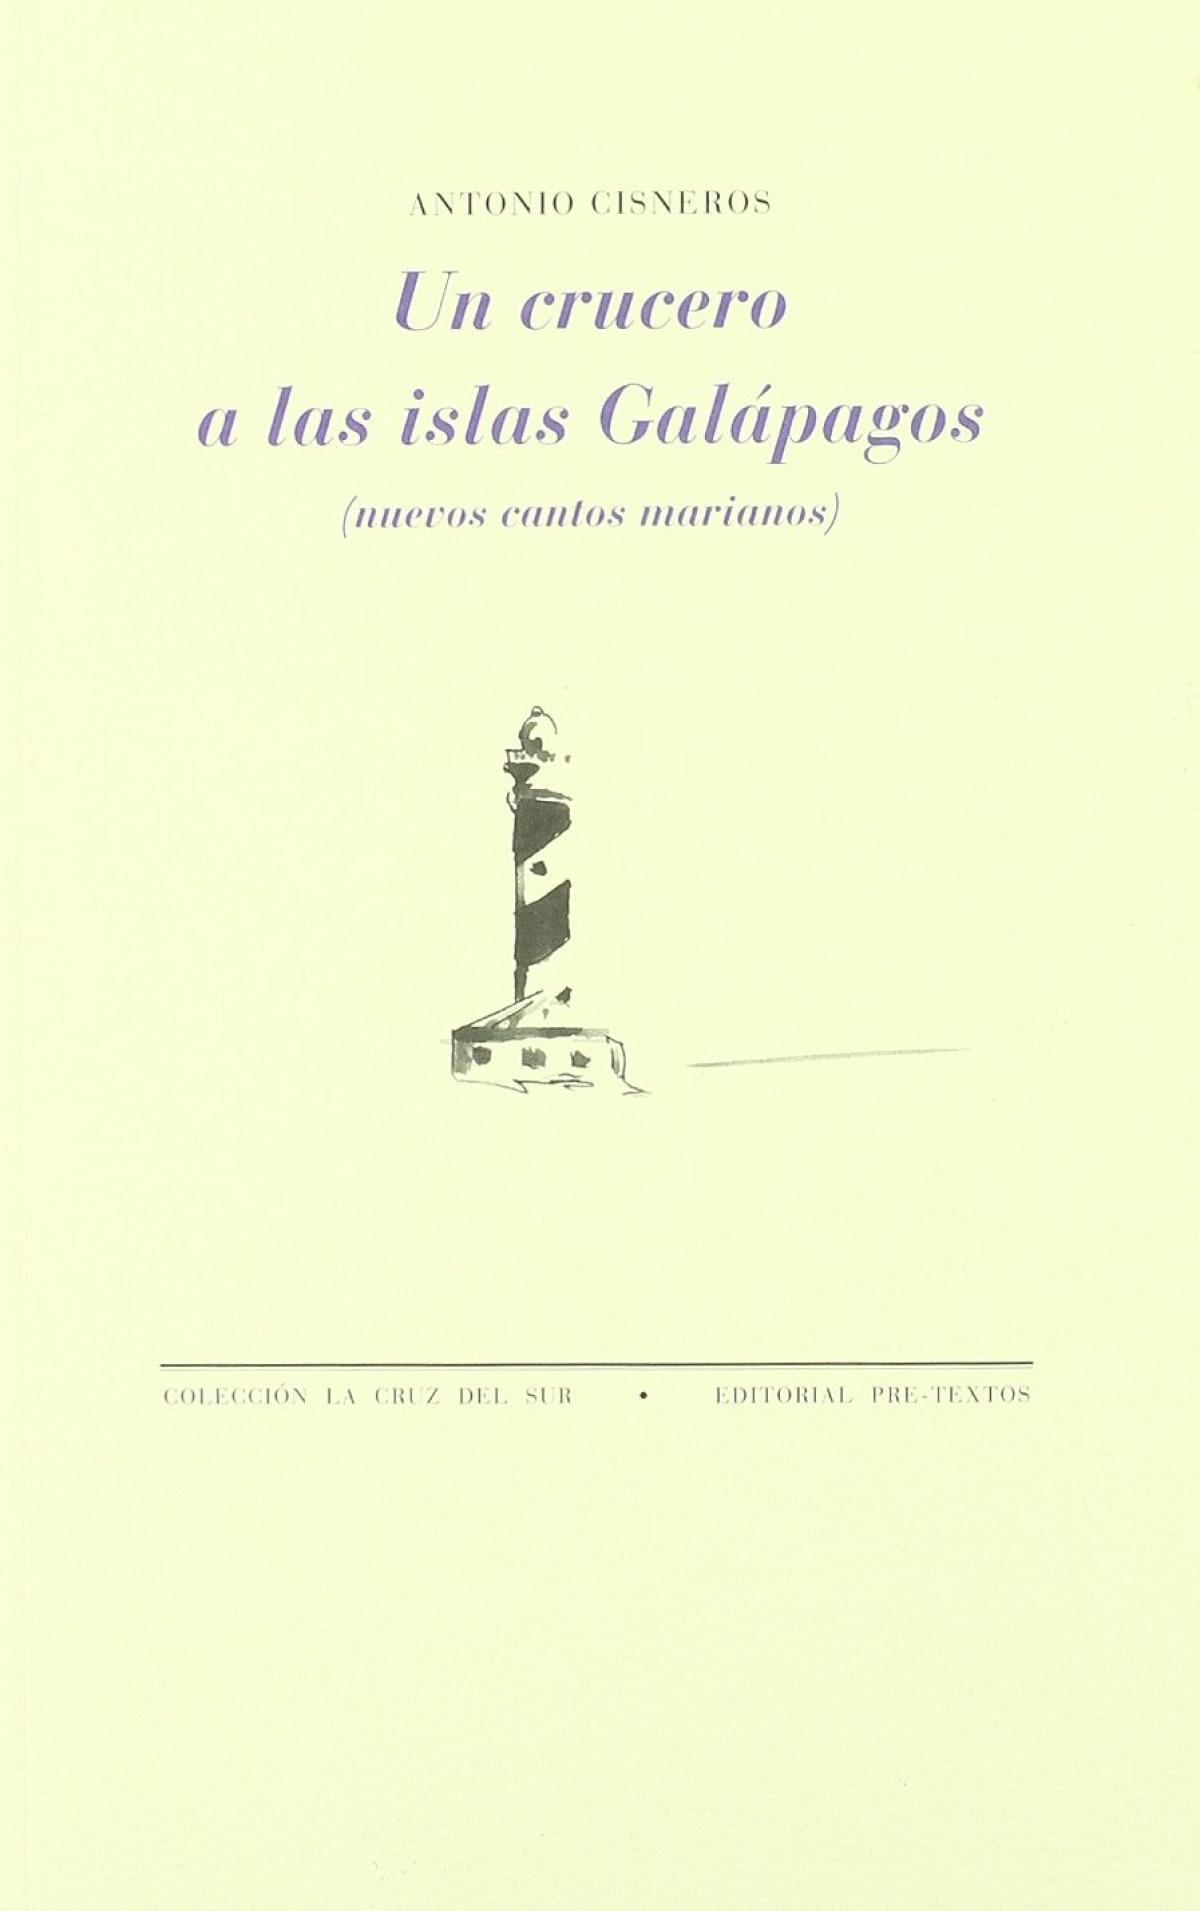 áUn crucero a las islas Galápagos